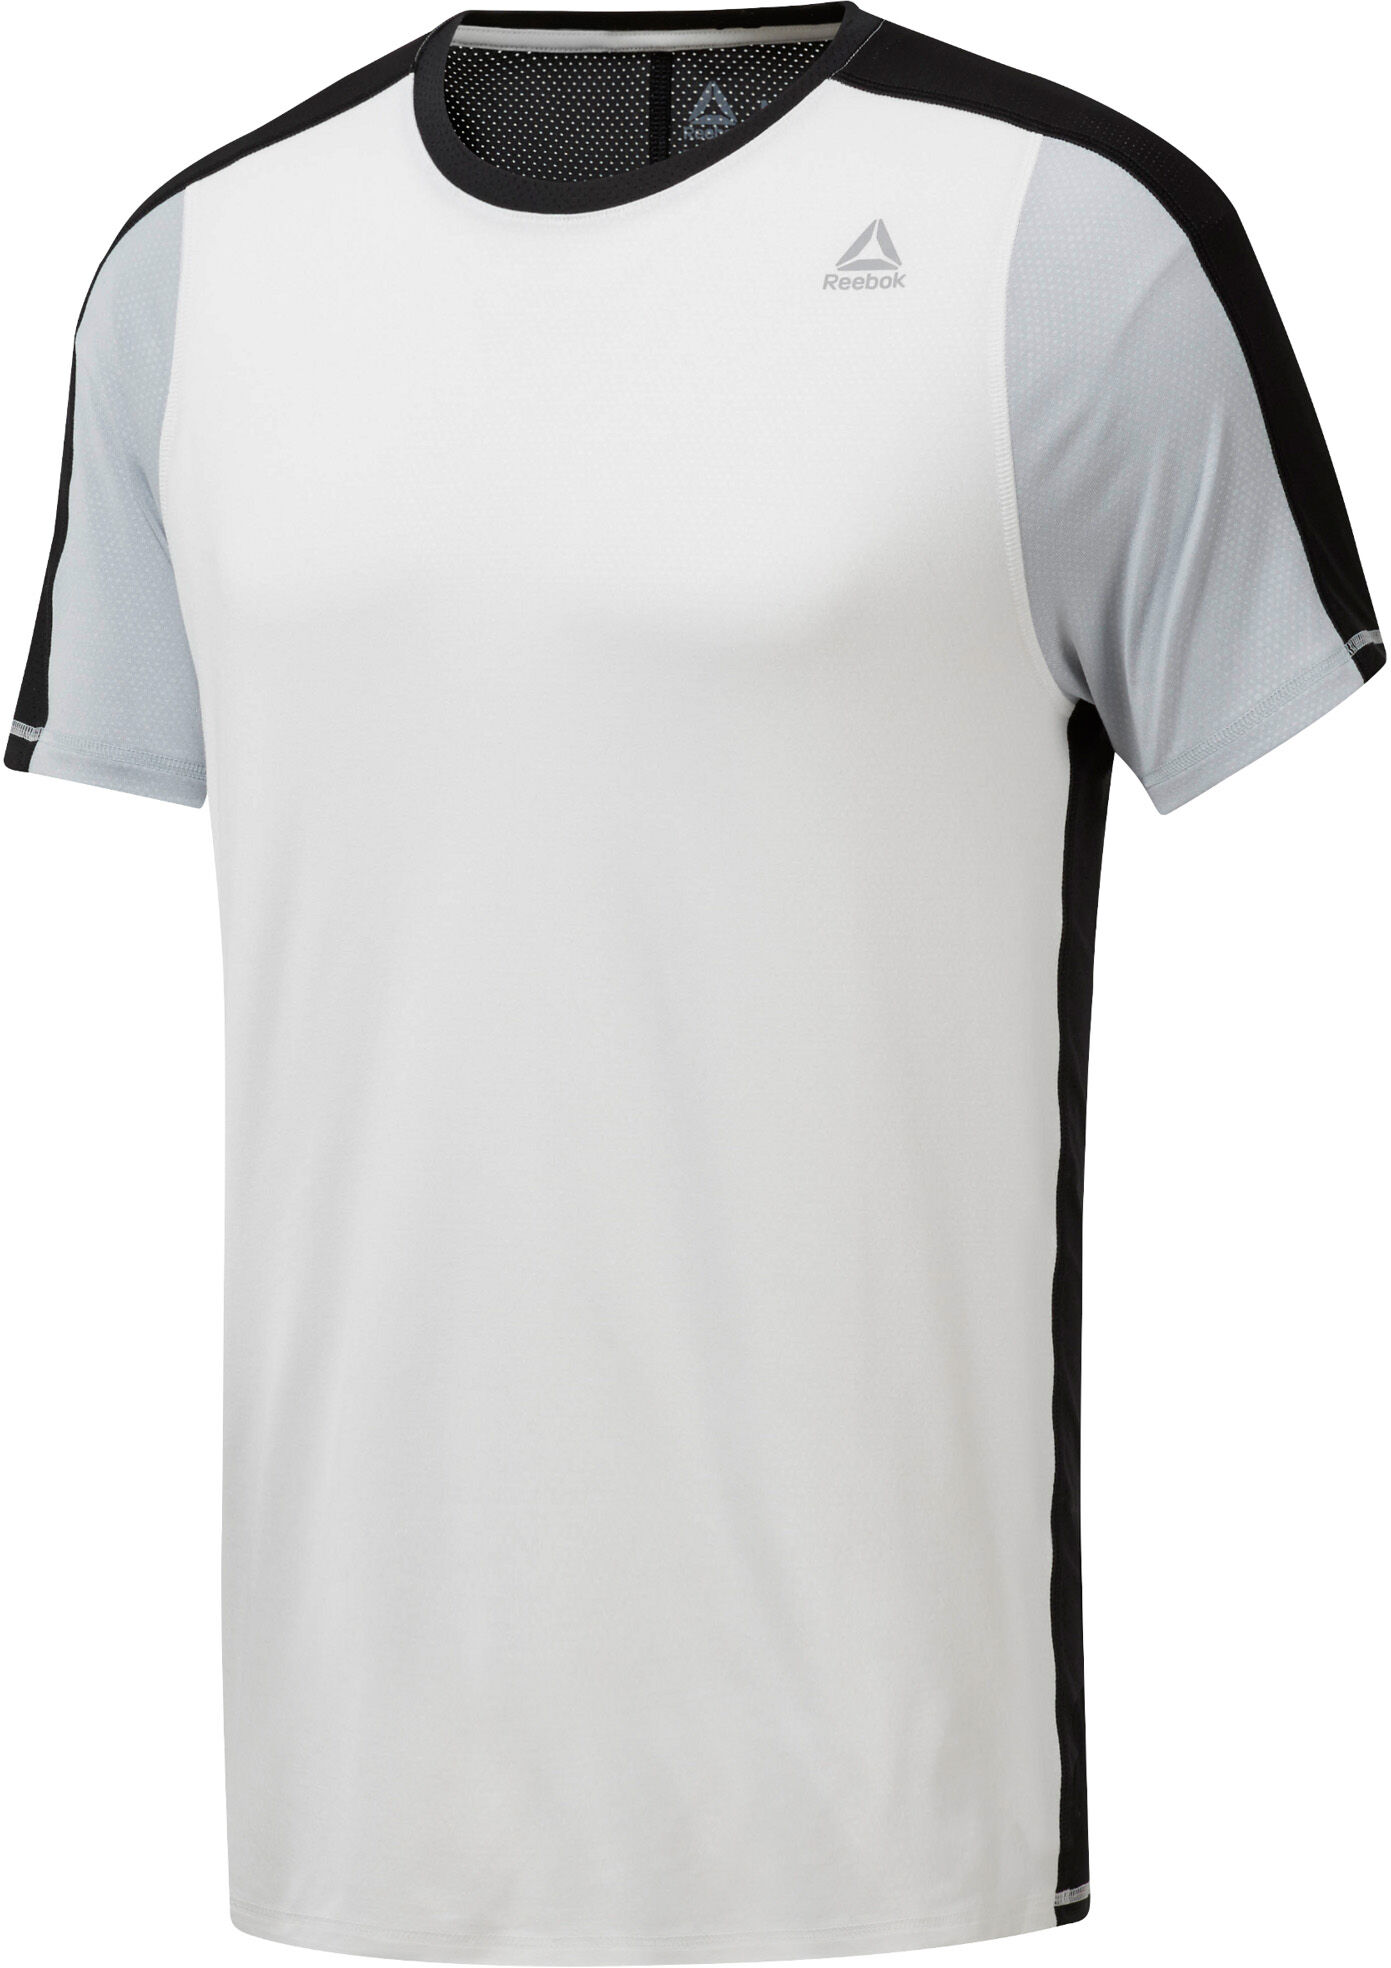 Tienda Reebok online   Moda deportiva   Intersport